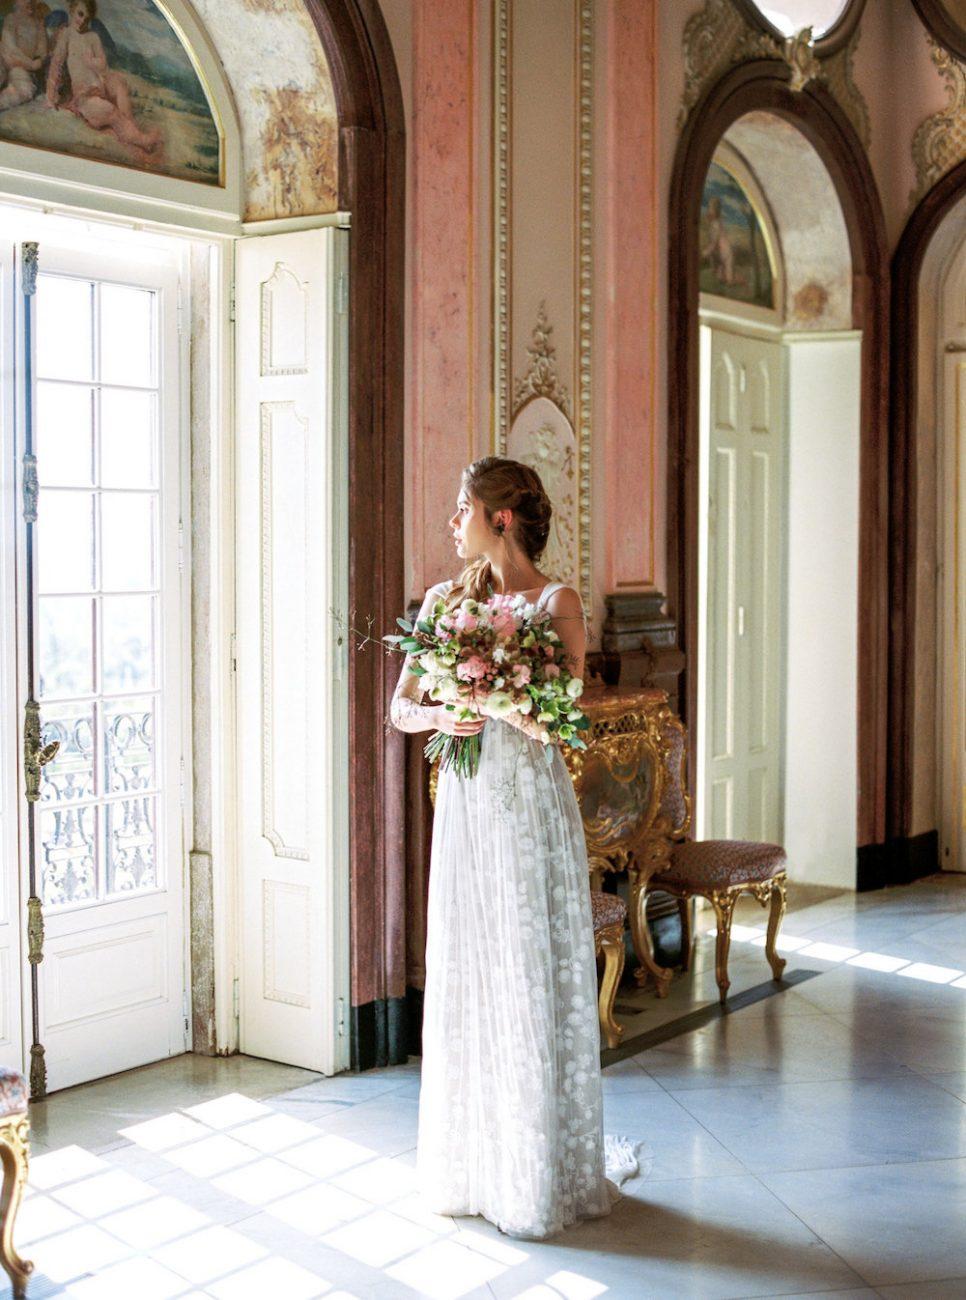 Palace Wedding Inspiration bride inside palace with flowers